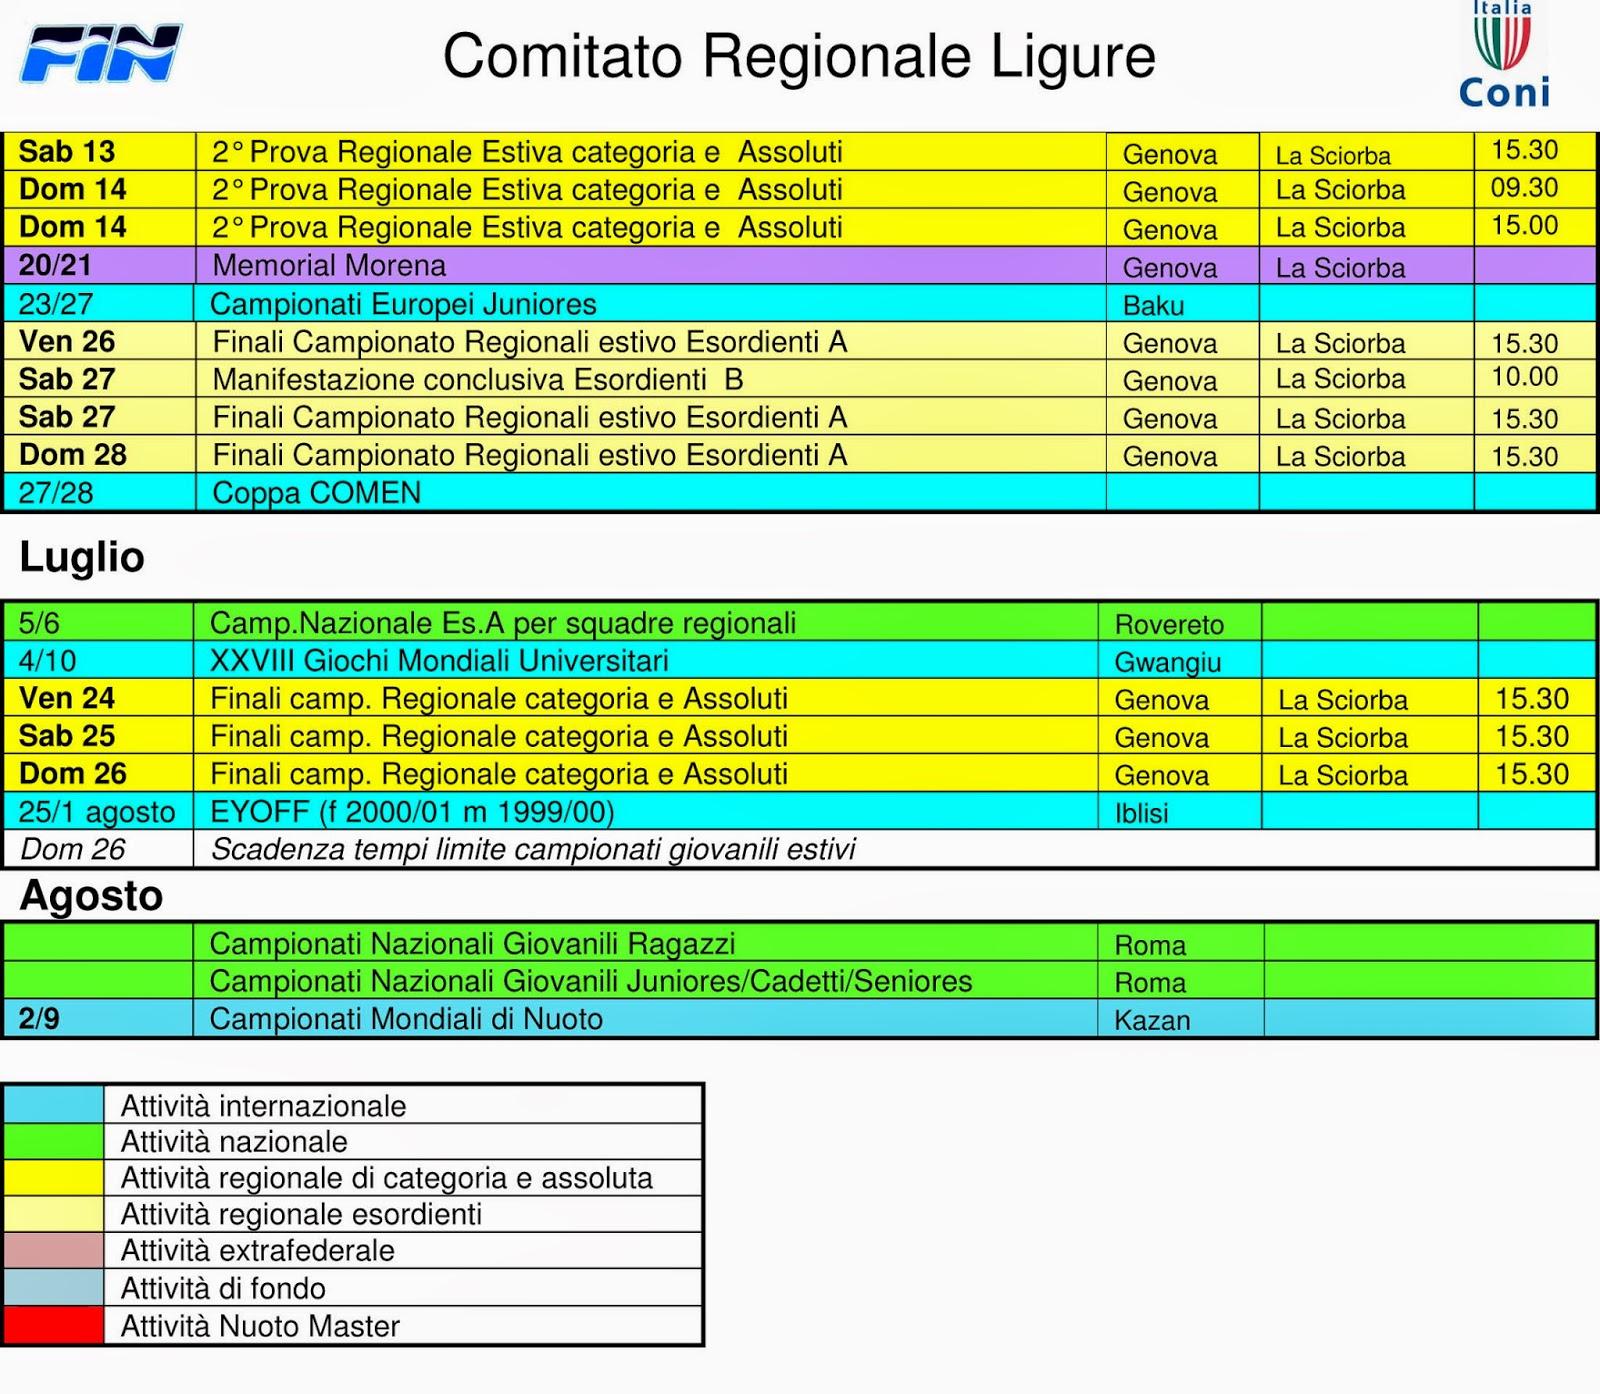 Calendario Regionale Liguria.Nuoto Dolce E Salato Calendario Regionale Ligure 2014 15 Di